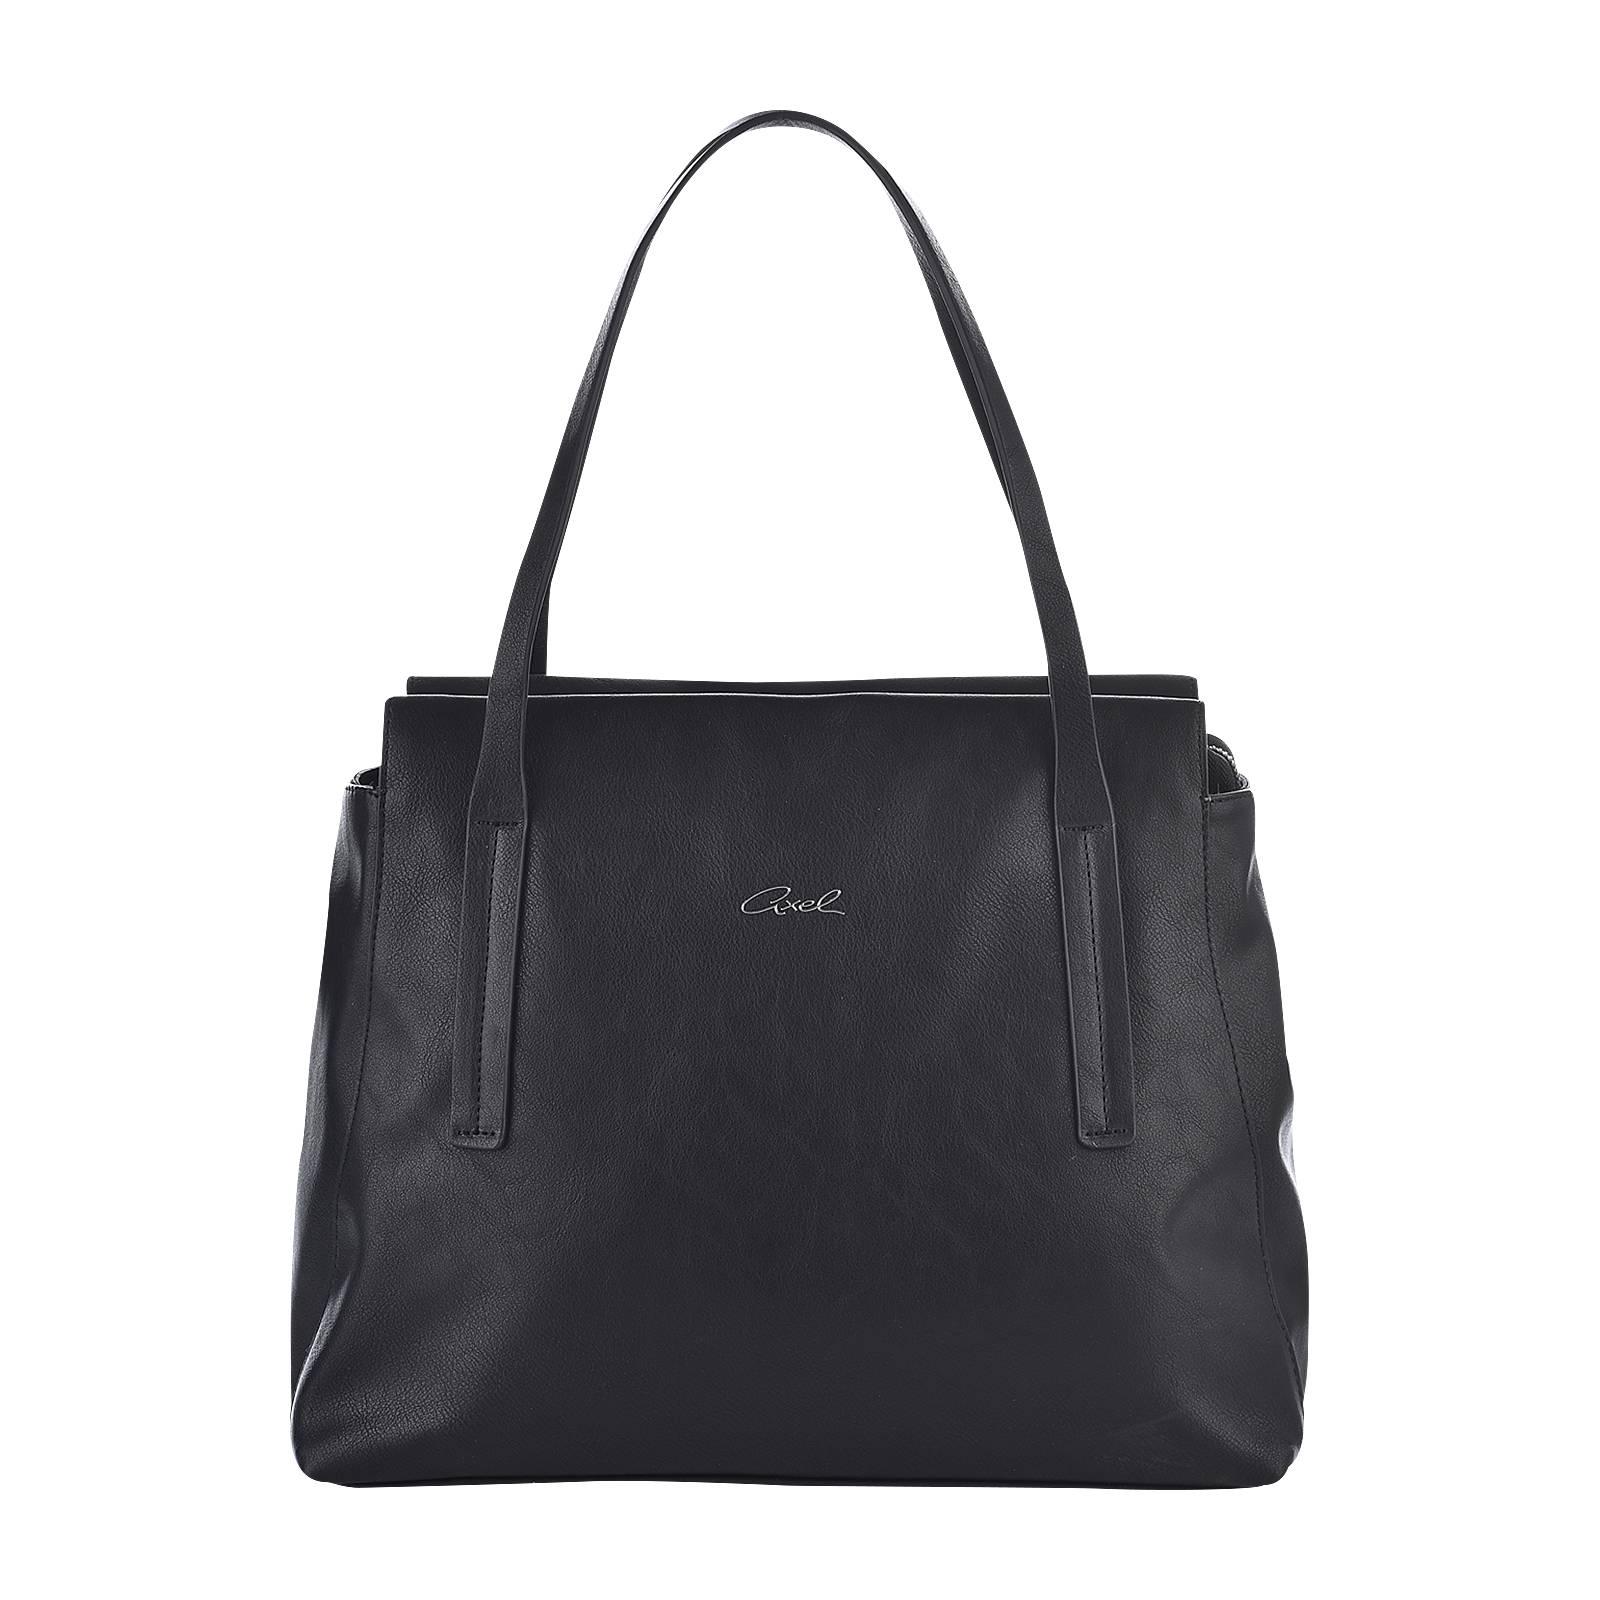 Arilene - Γυναικεία τσάντα Axel από δερμα συνθετικο - Gianna Kazakou ... 62cadf38b35